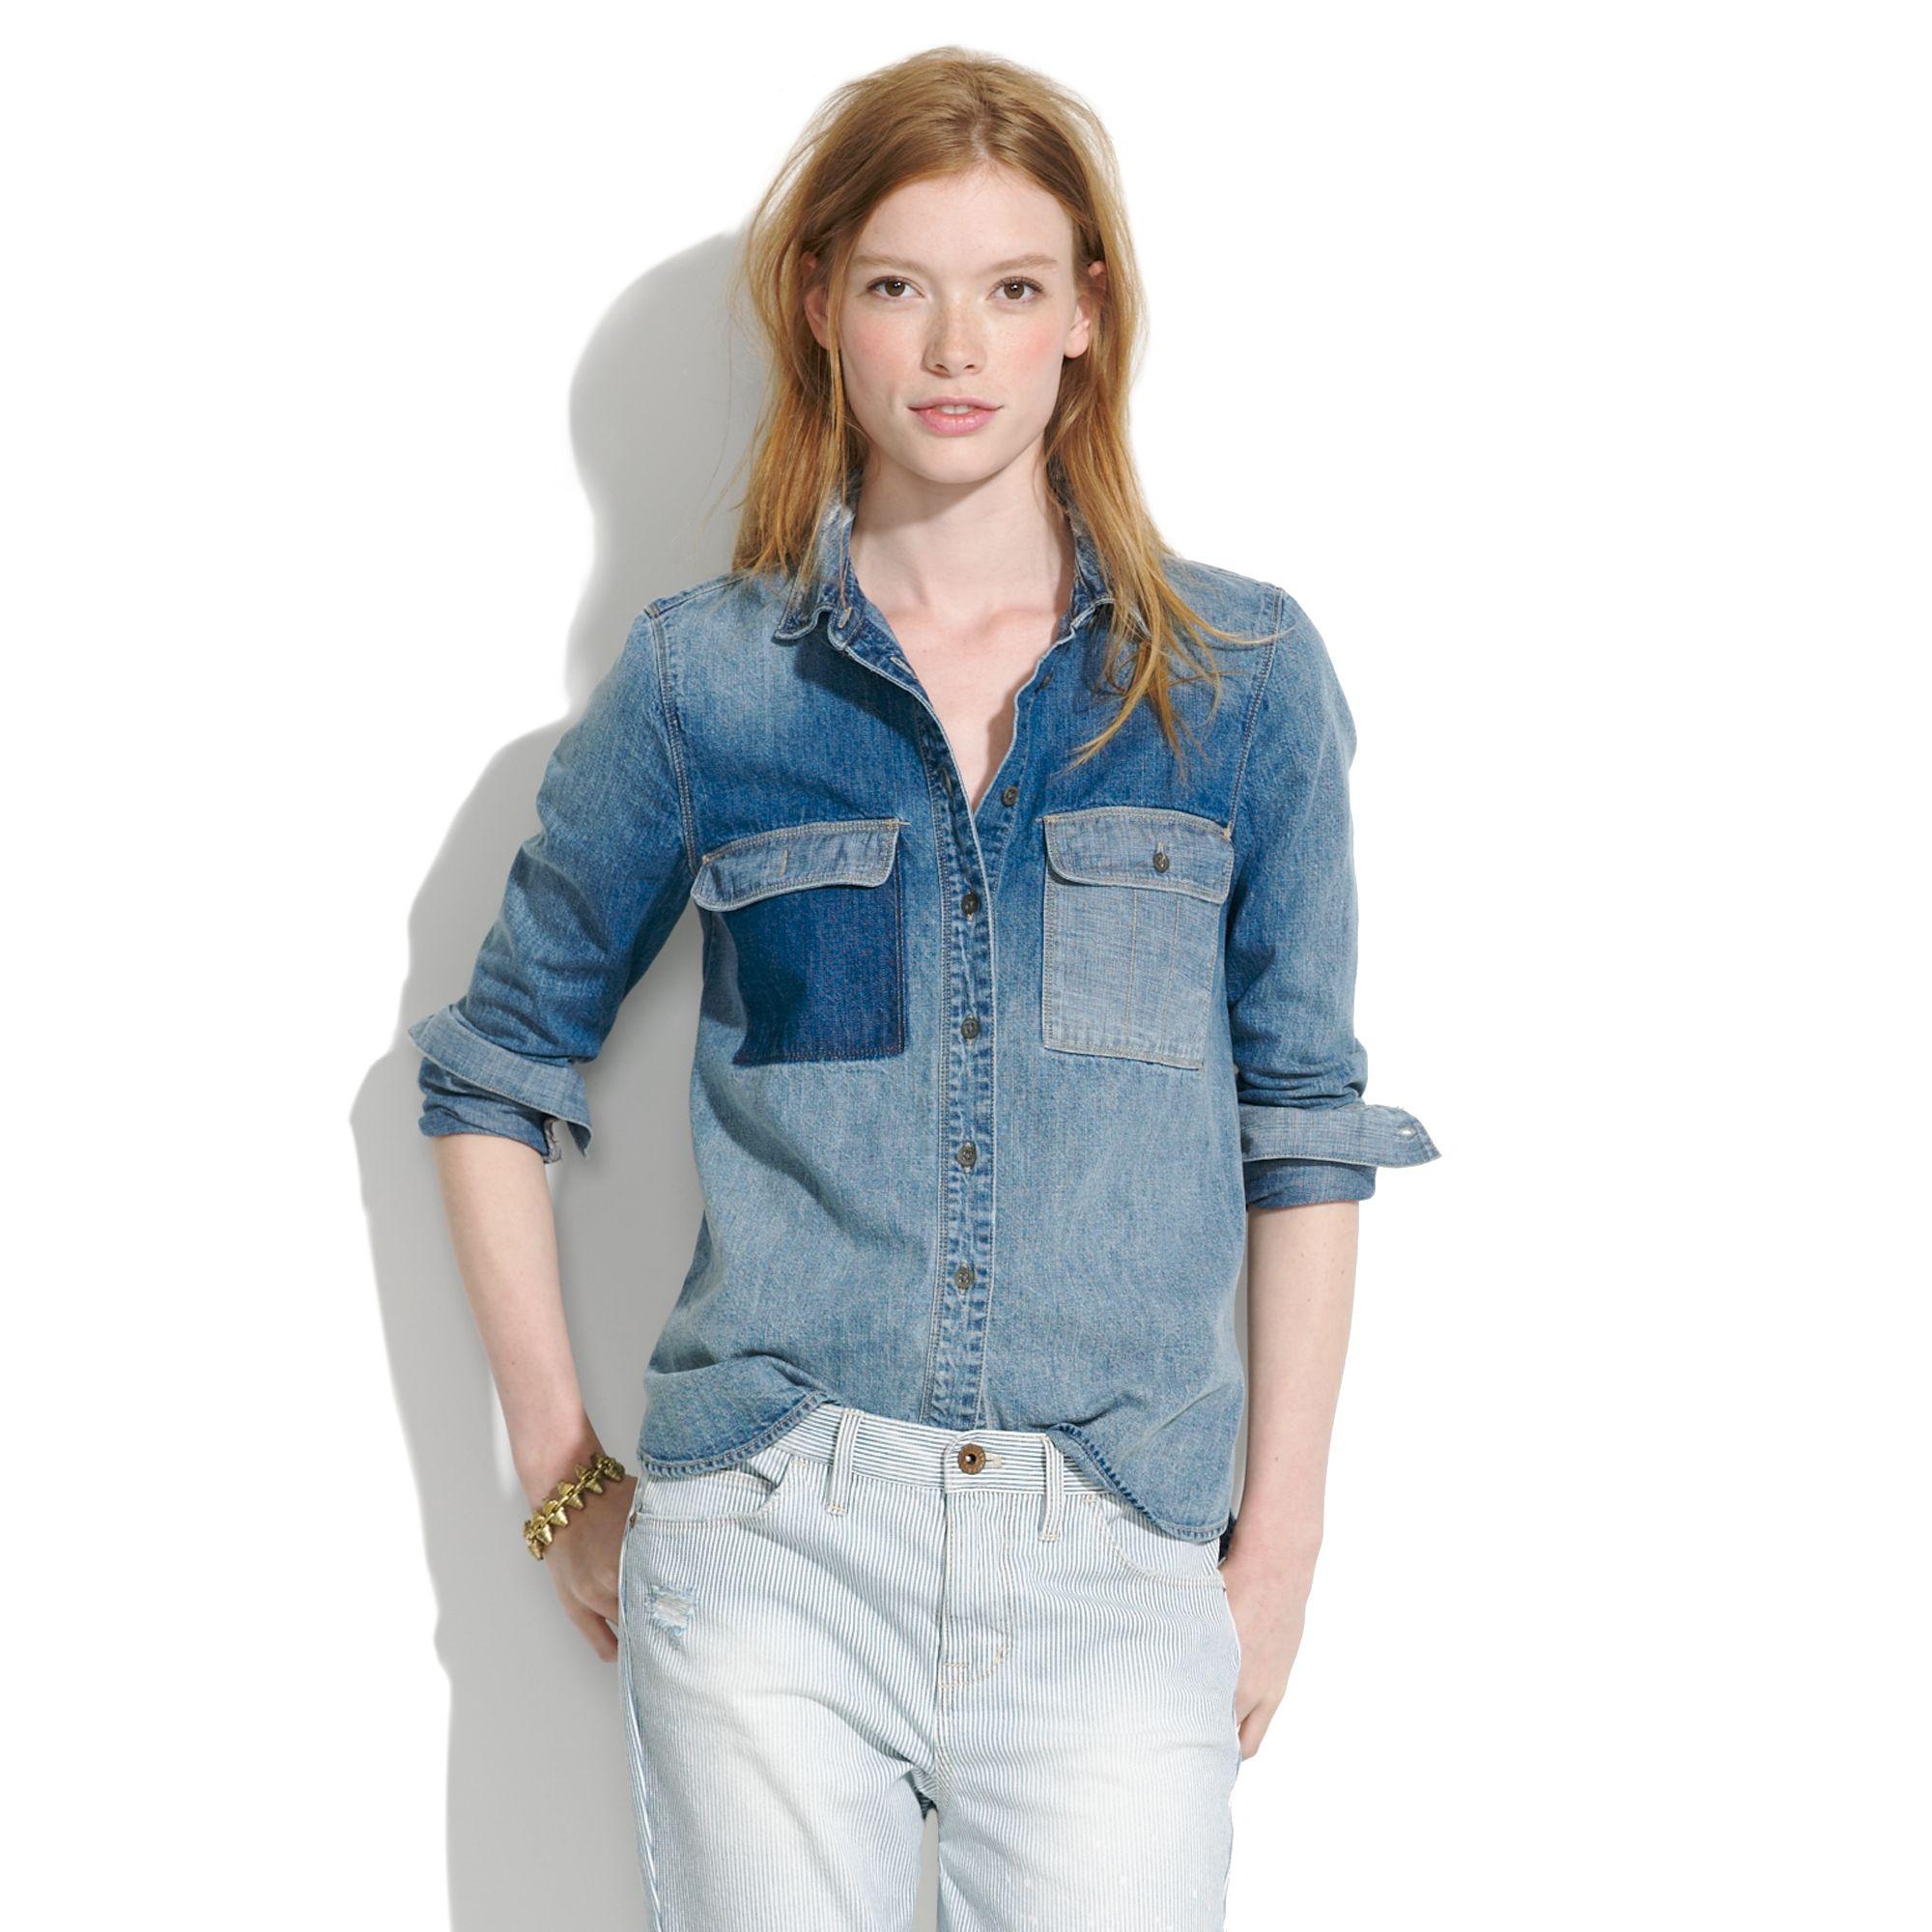 Lyst madewell rivet thread chambray shirt in blue for Chambray shirt women